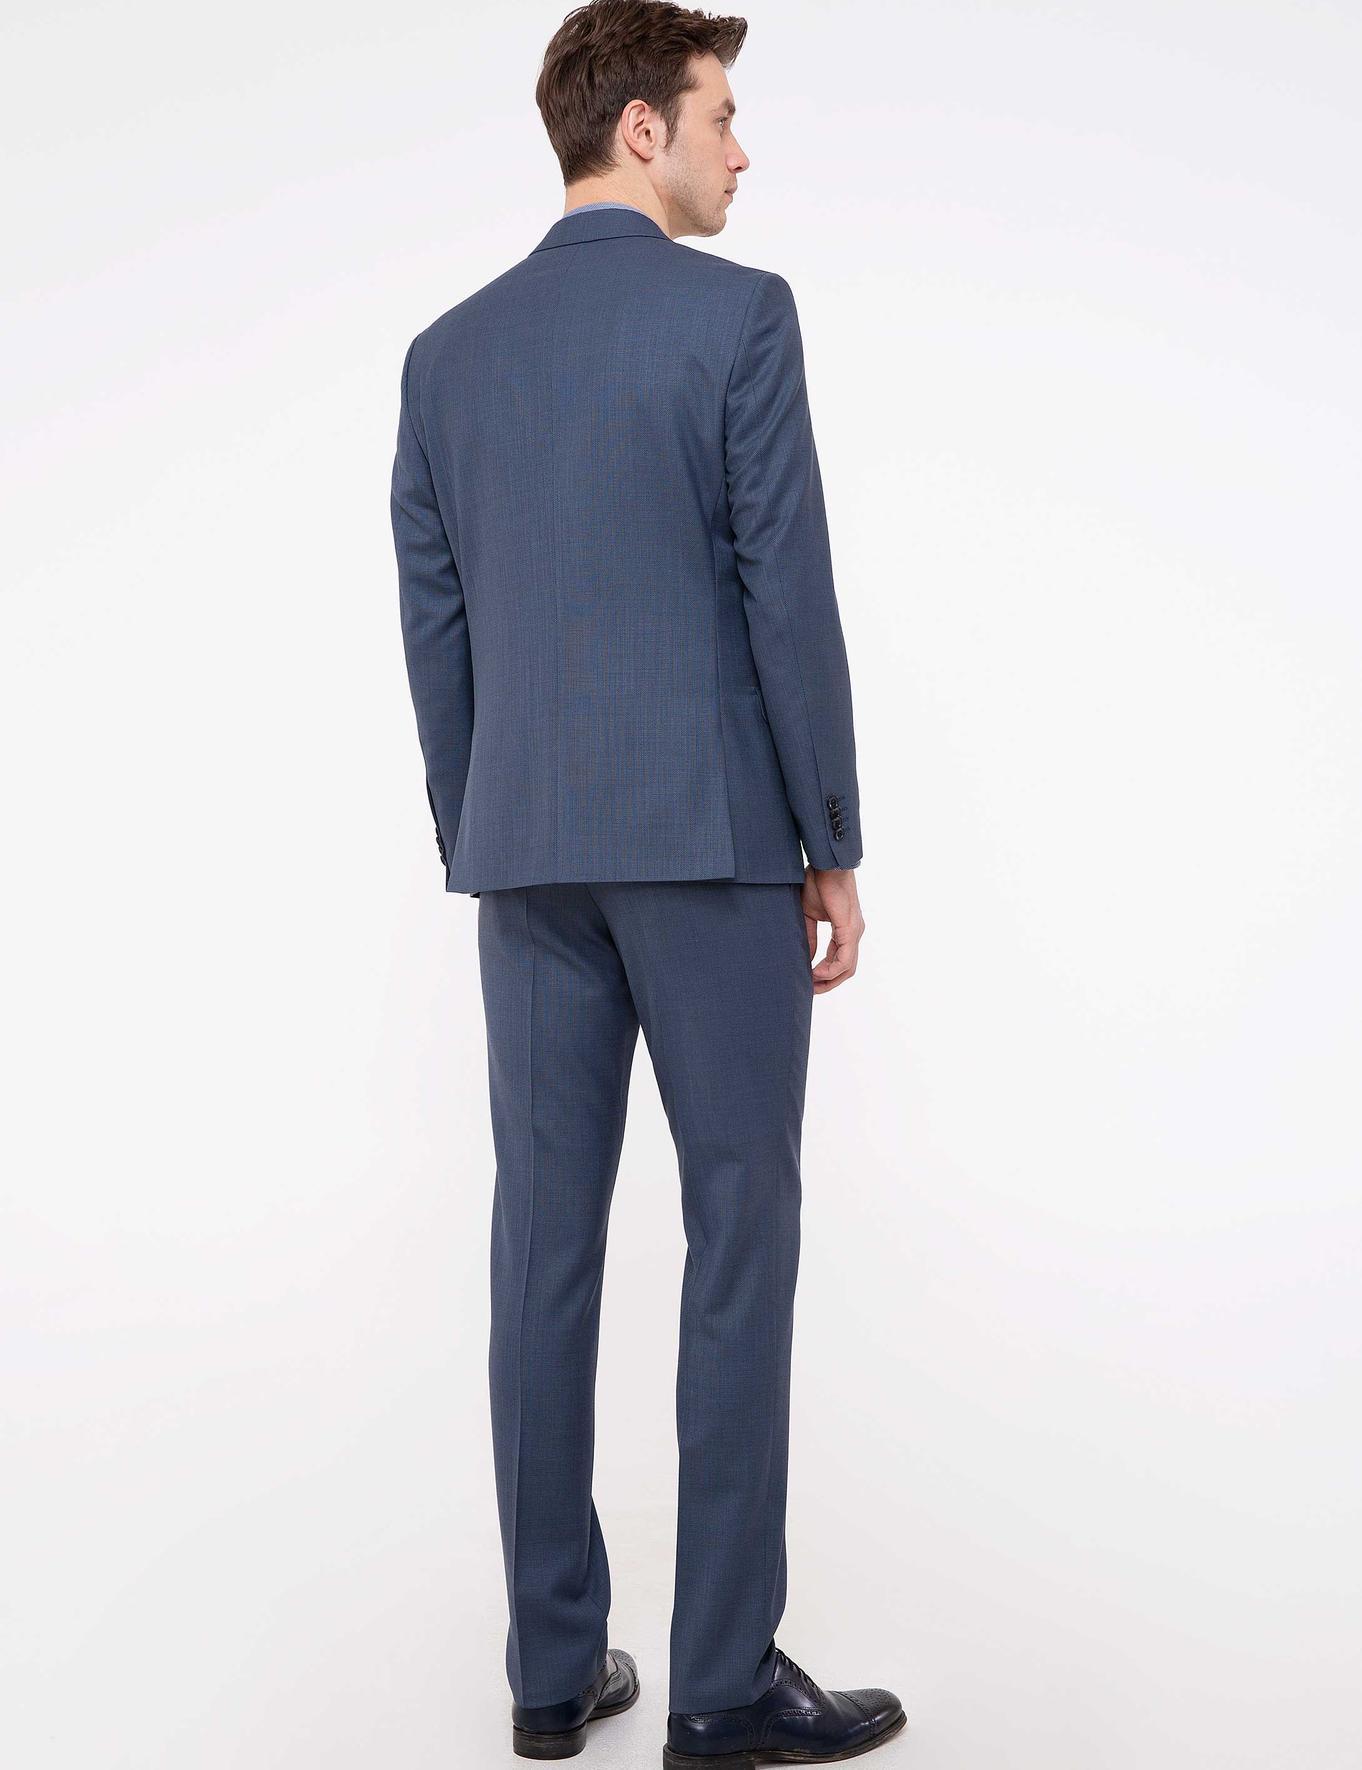 İndigo Slim Fit Takım Elbise - 50200616041